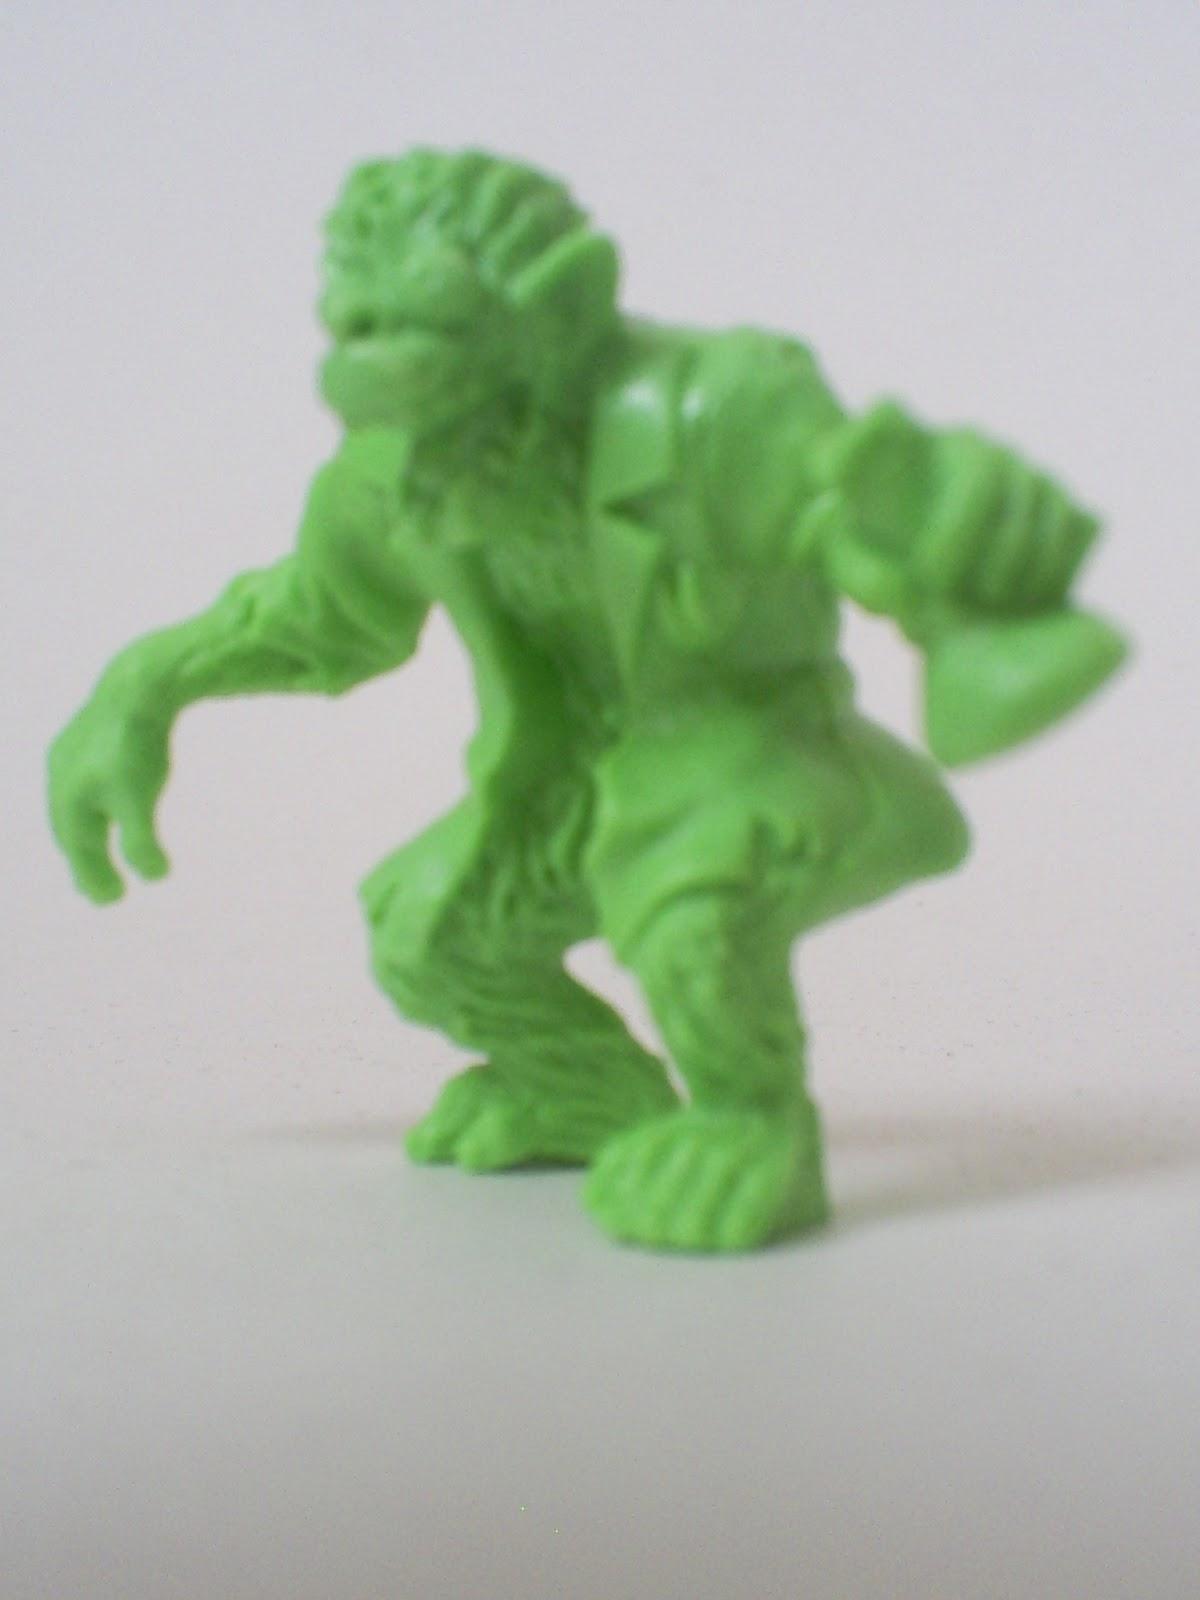 S.L.U.G Zombies Mini Figures 3pack Wave 3 LOT A